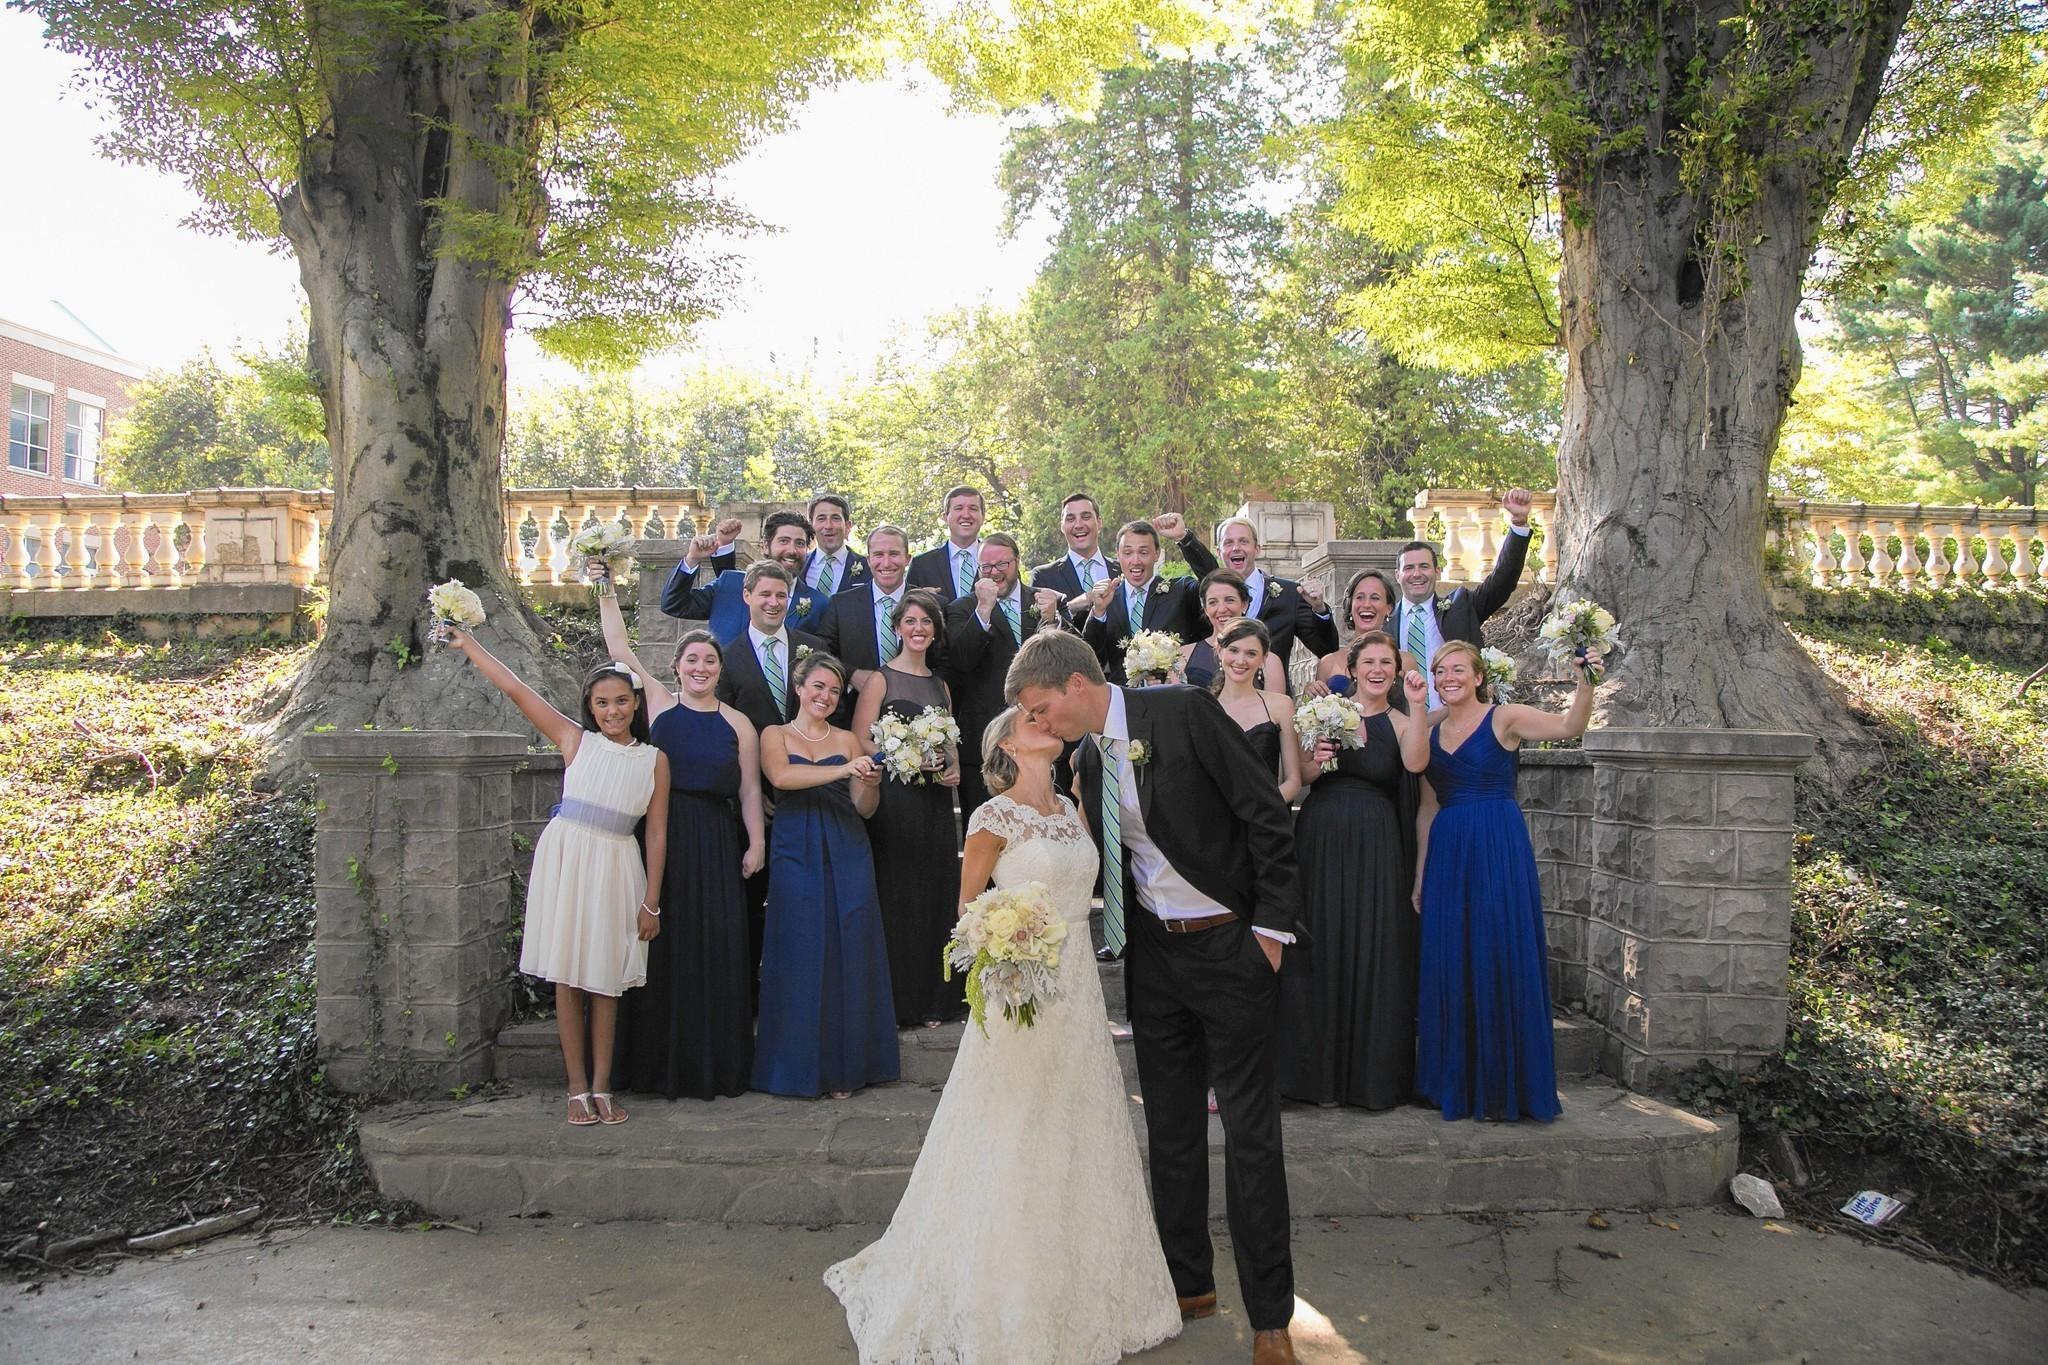 Wedded Meriel Colglazier And Garrett Wilson Met On An